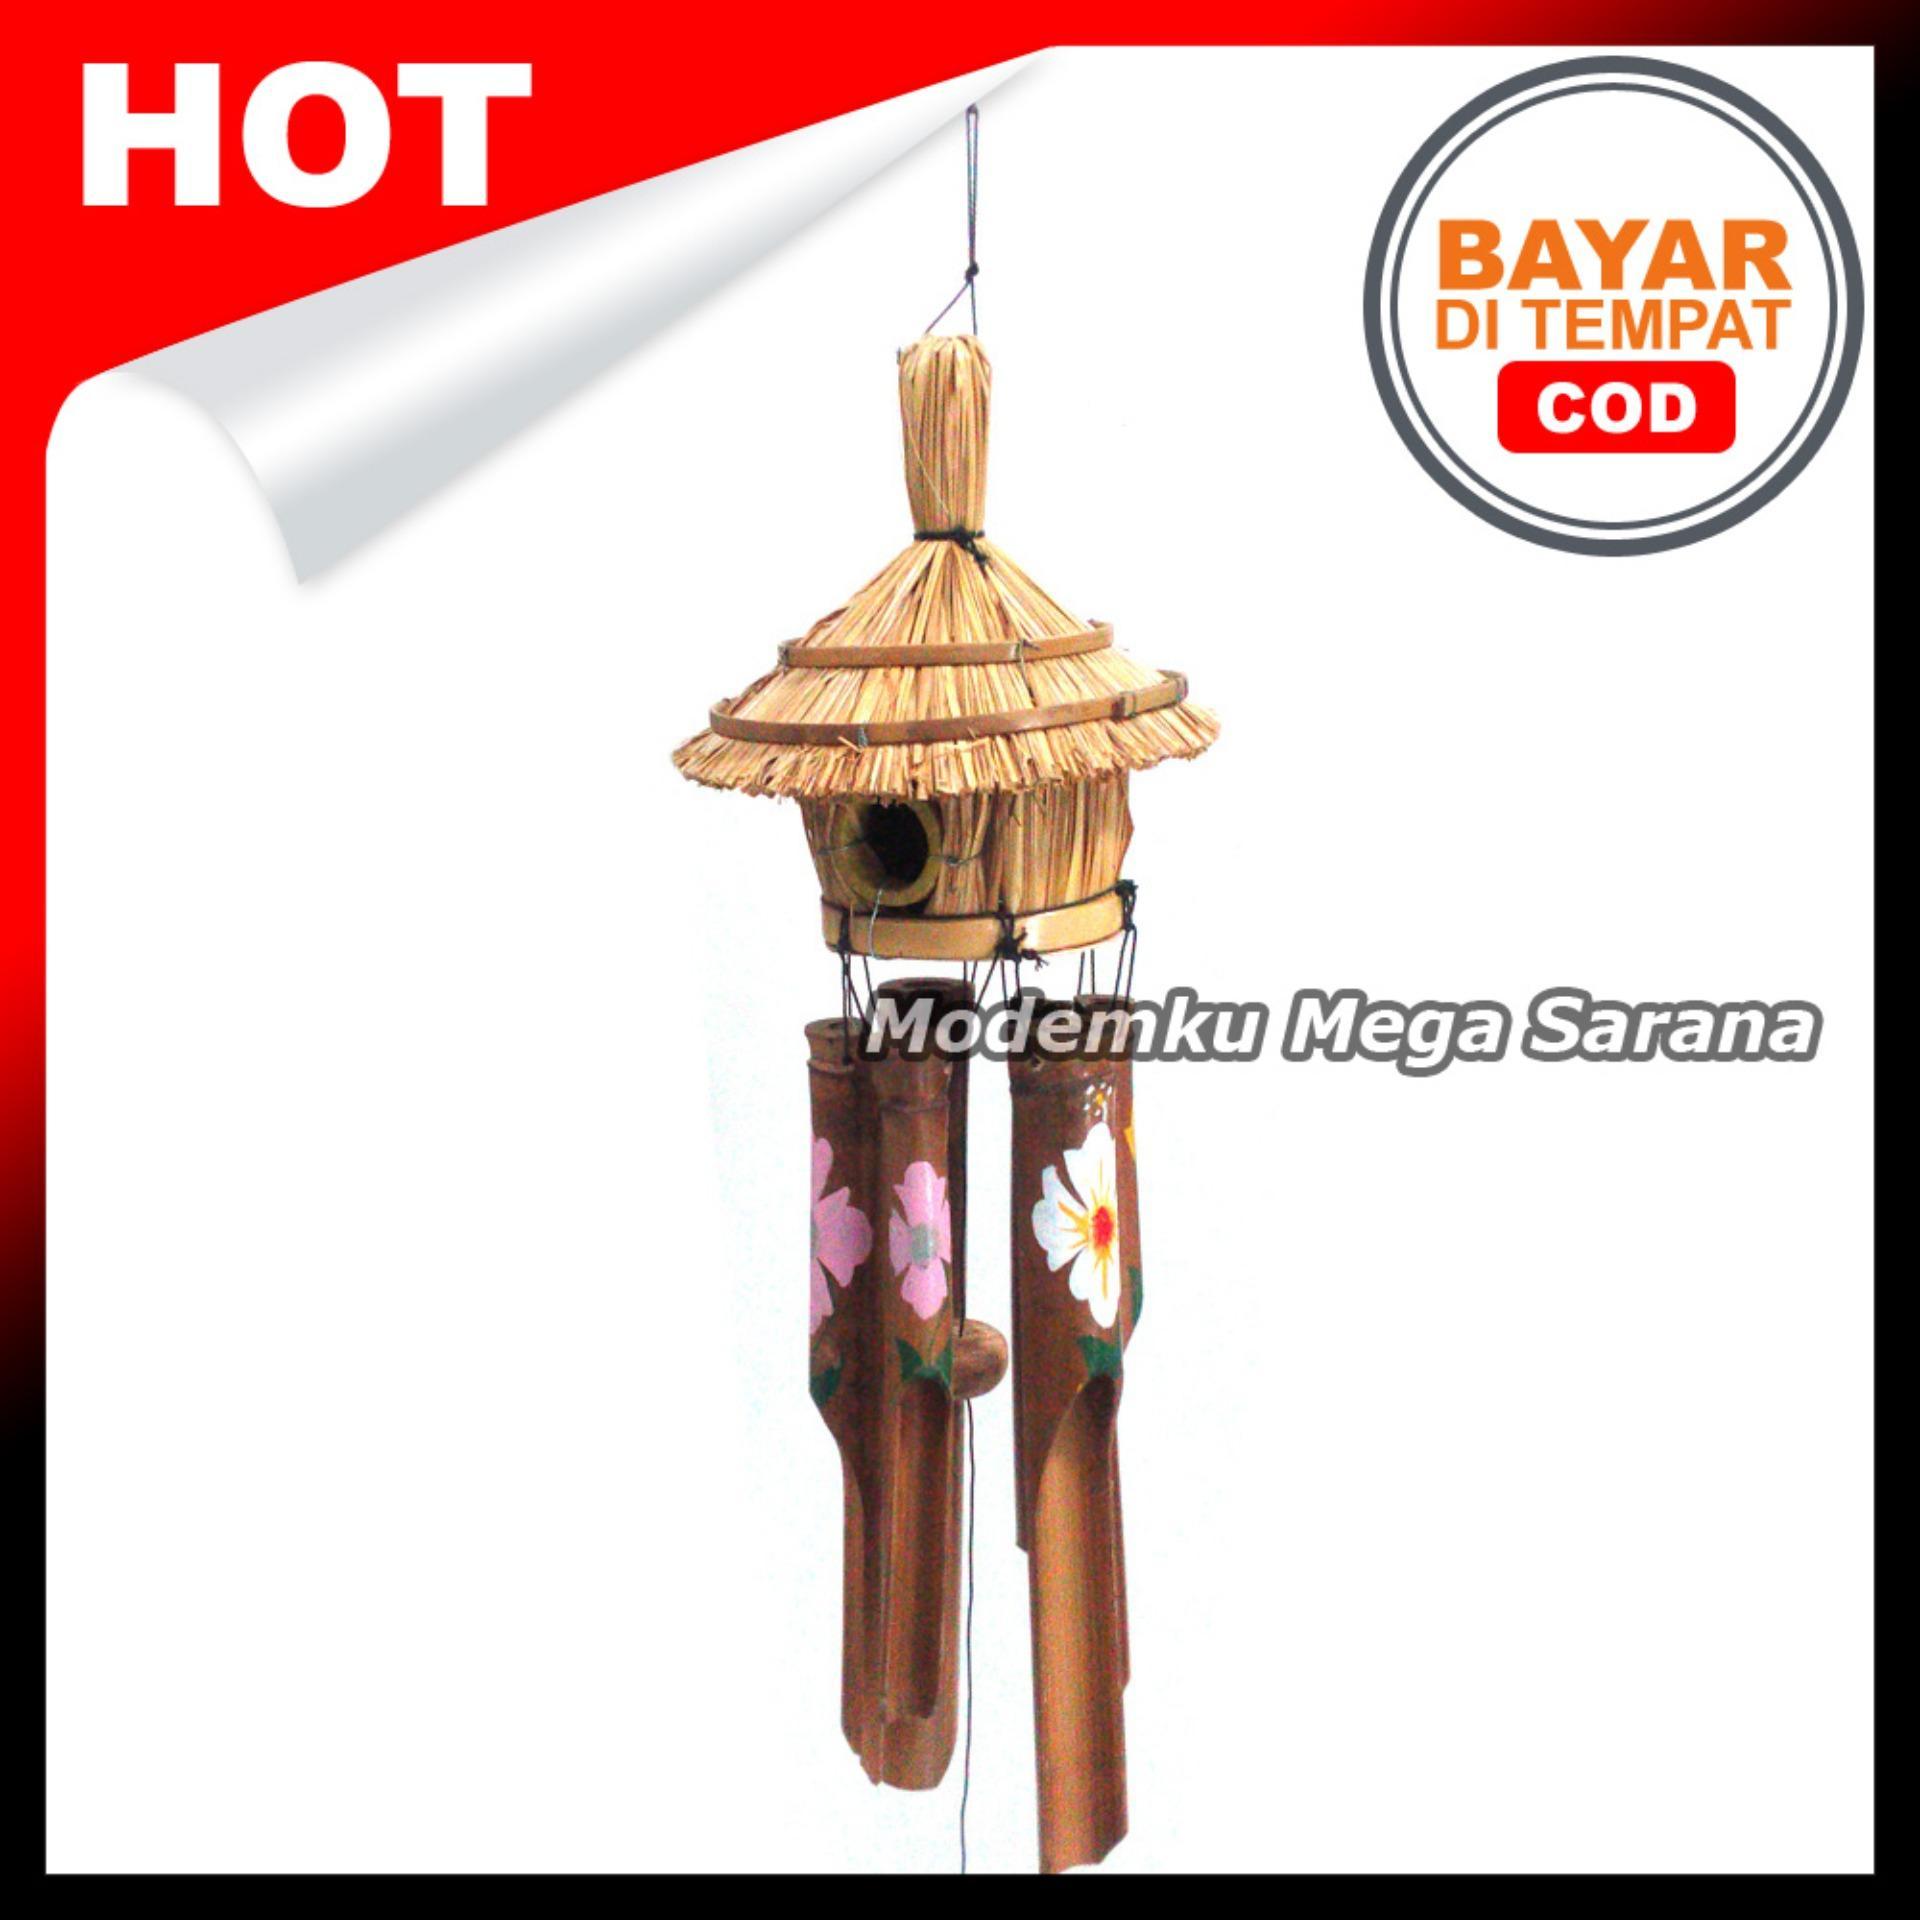 Klontong Bambu Sangkar Burung 50x18x18 cm | Genta Angin, Lonceng Angin, Wind Chime,